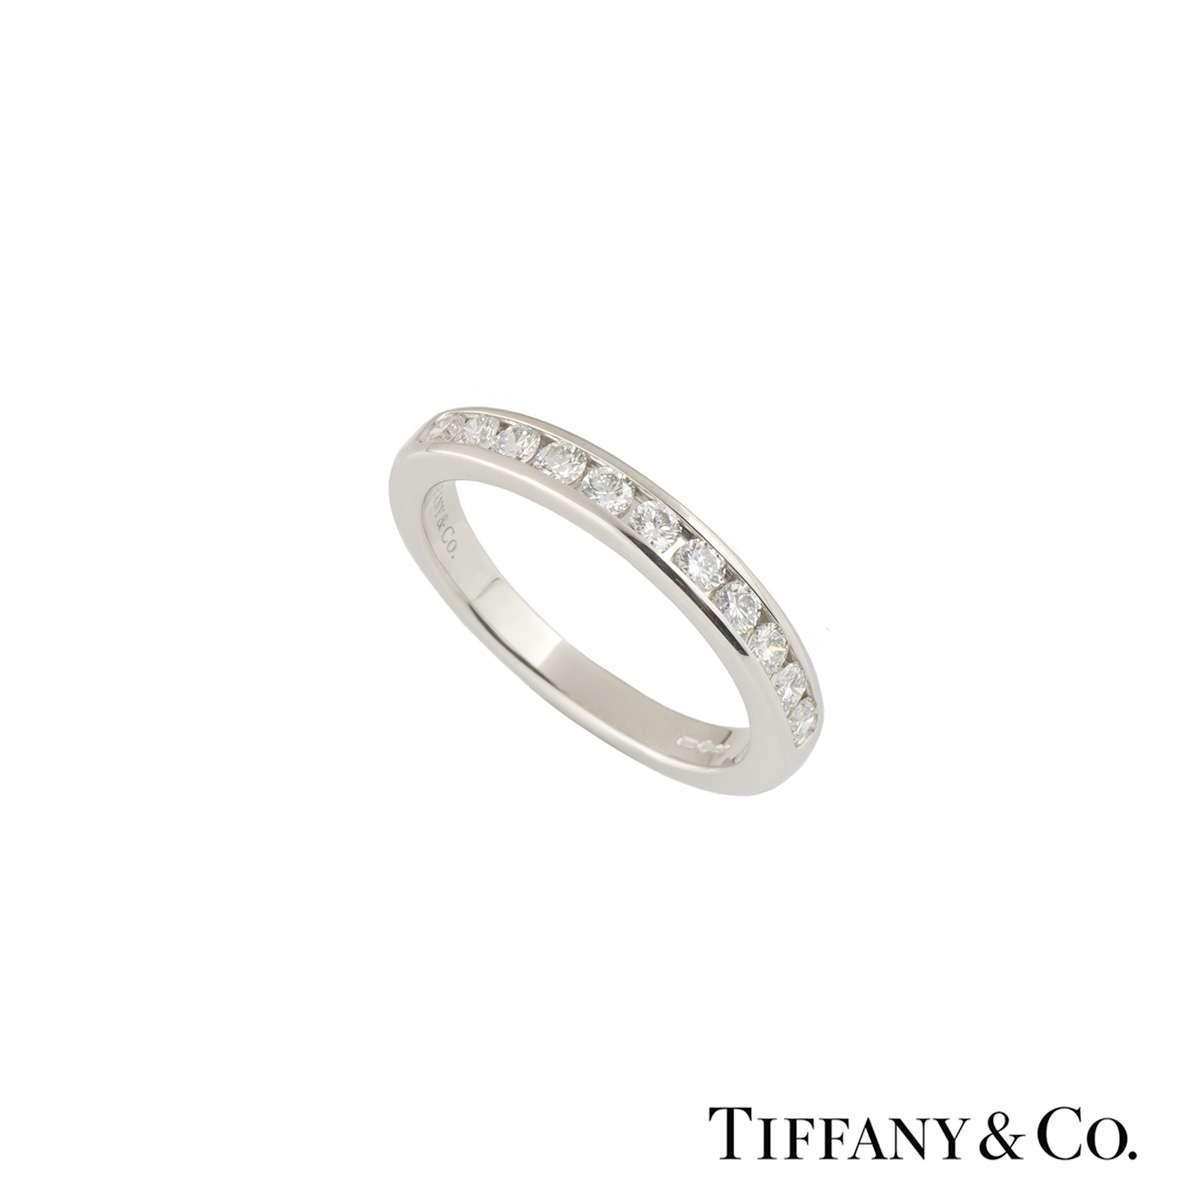 Tiffany & Co. Platinum Diamond Wedding Band 0.33ct